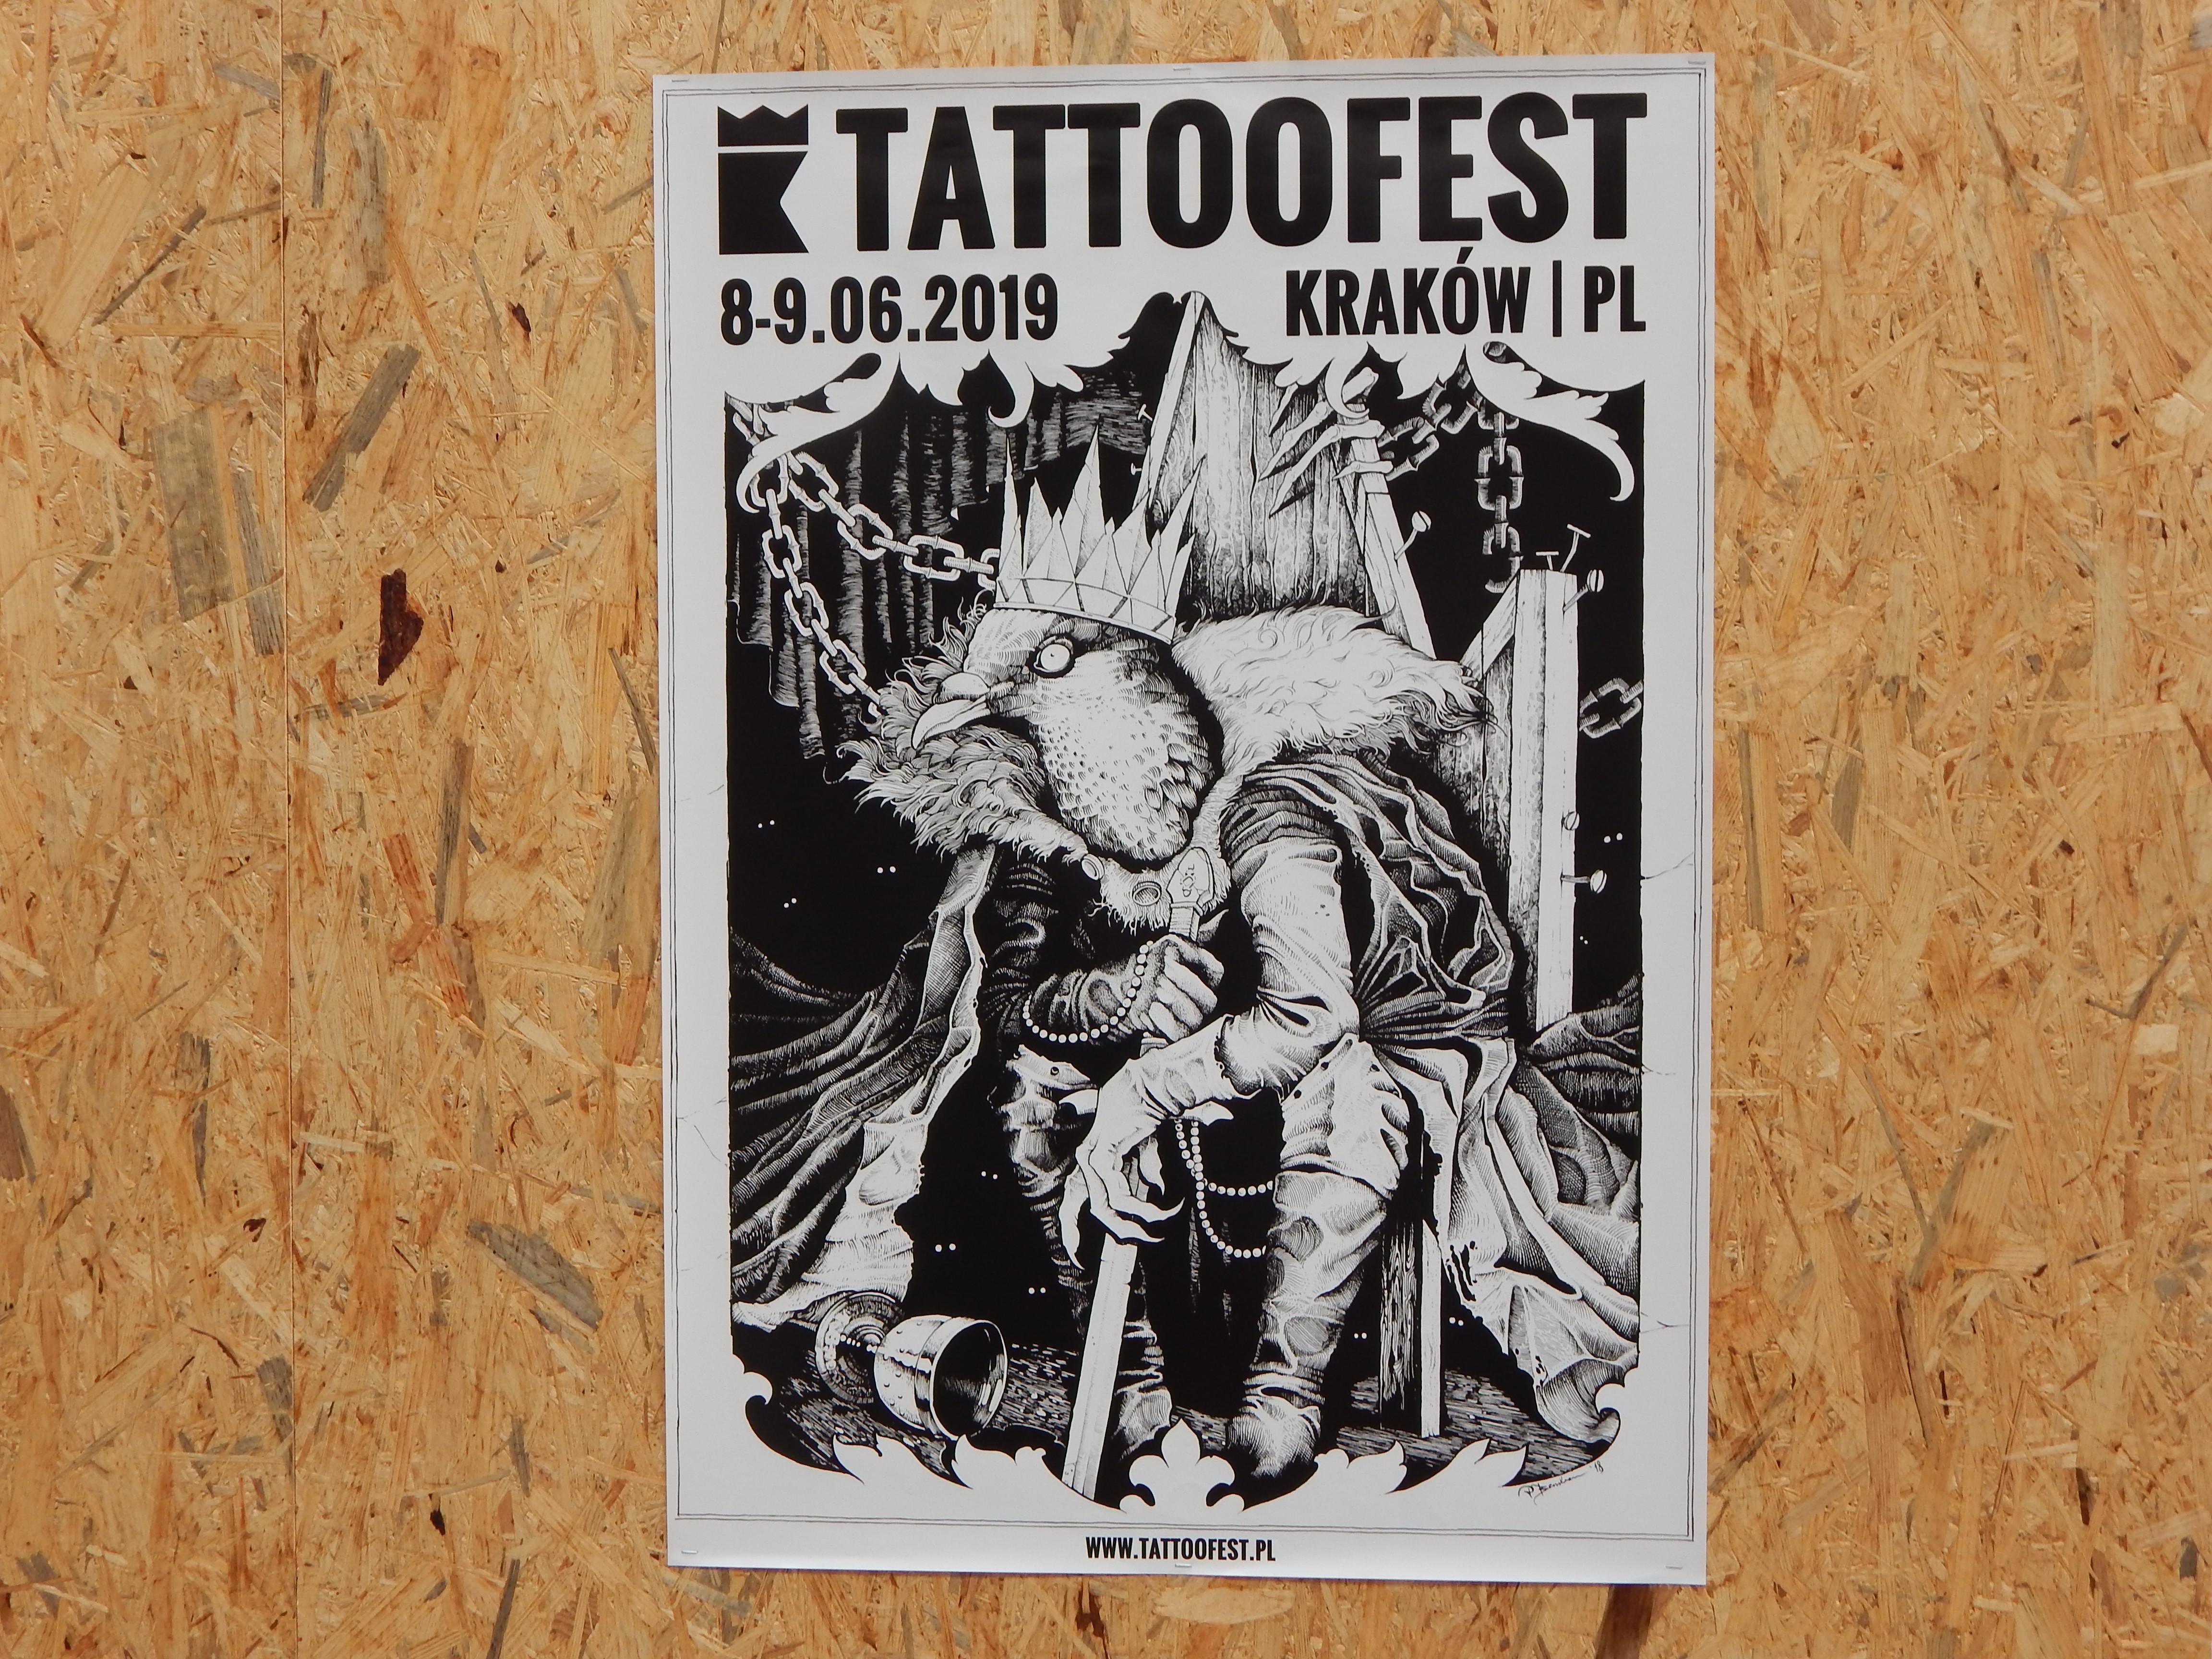 Tattoofest Convention Relacja F7krakow